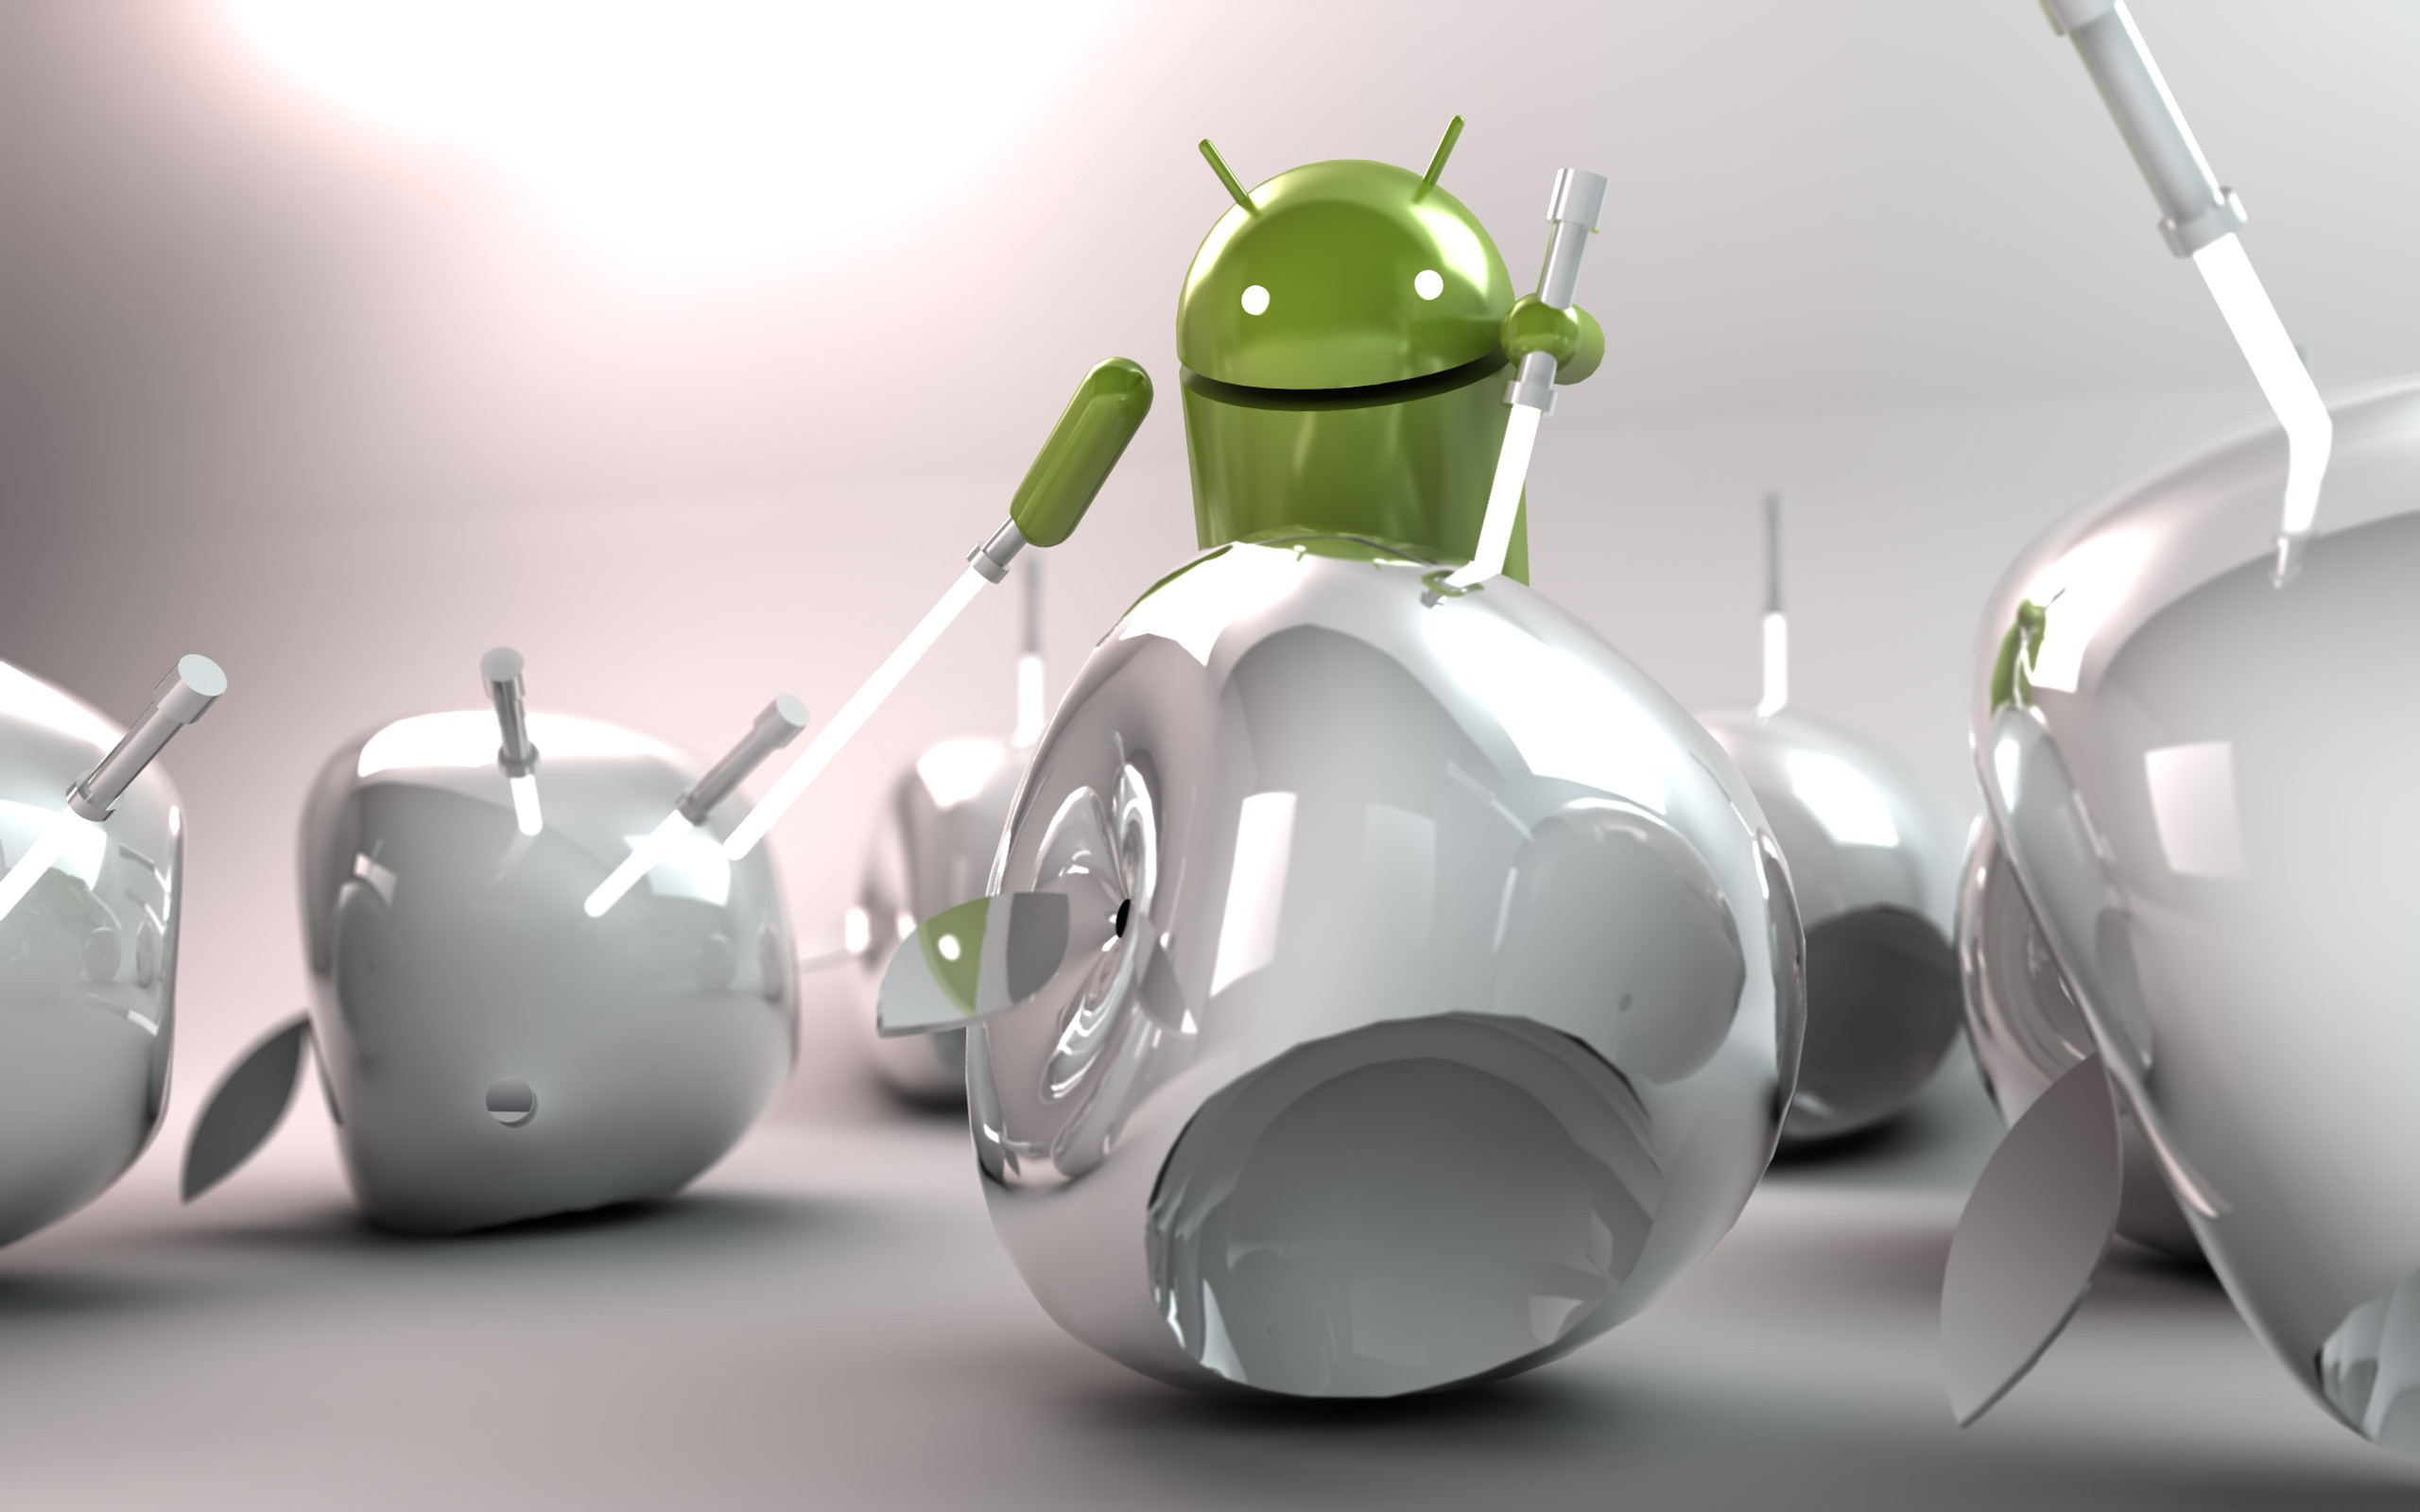 Крутые Обои На Андроид Бесплатно